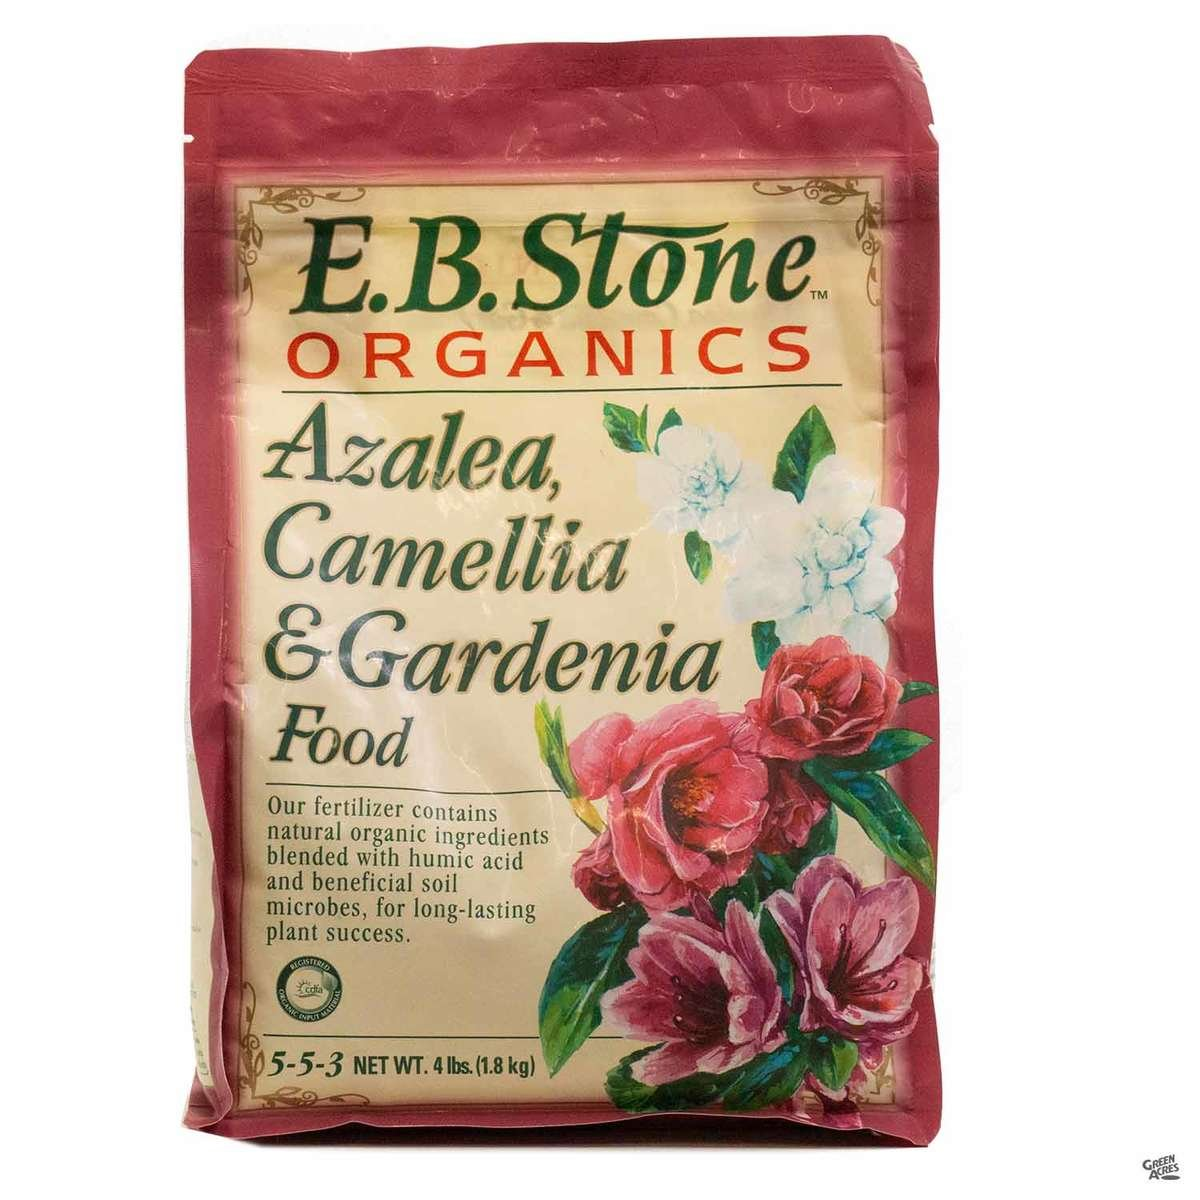 E.B. Stone™ Organics Azalea, Camellia & Gardenia Food